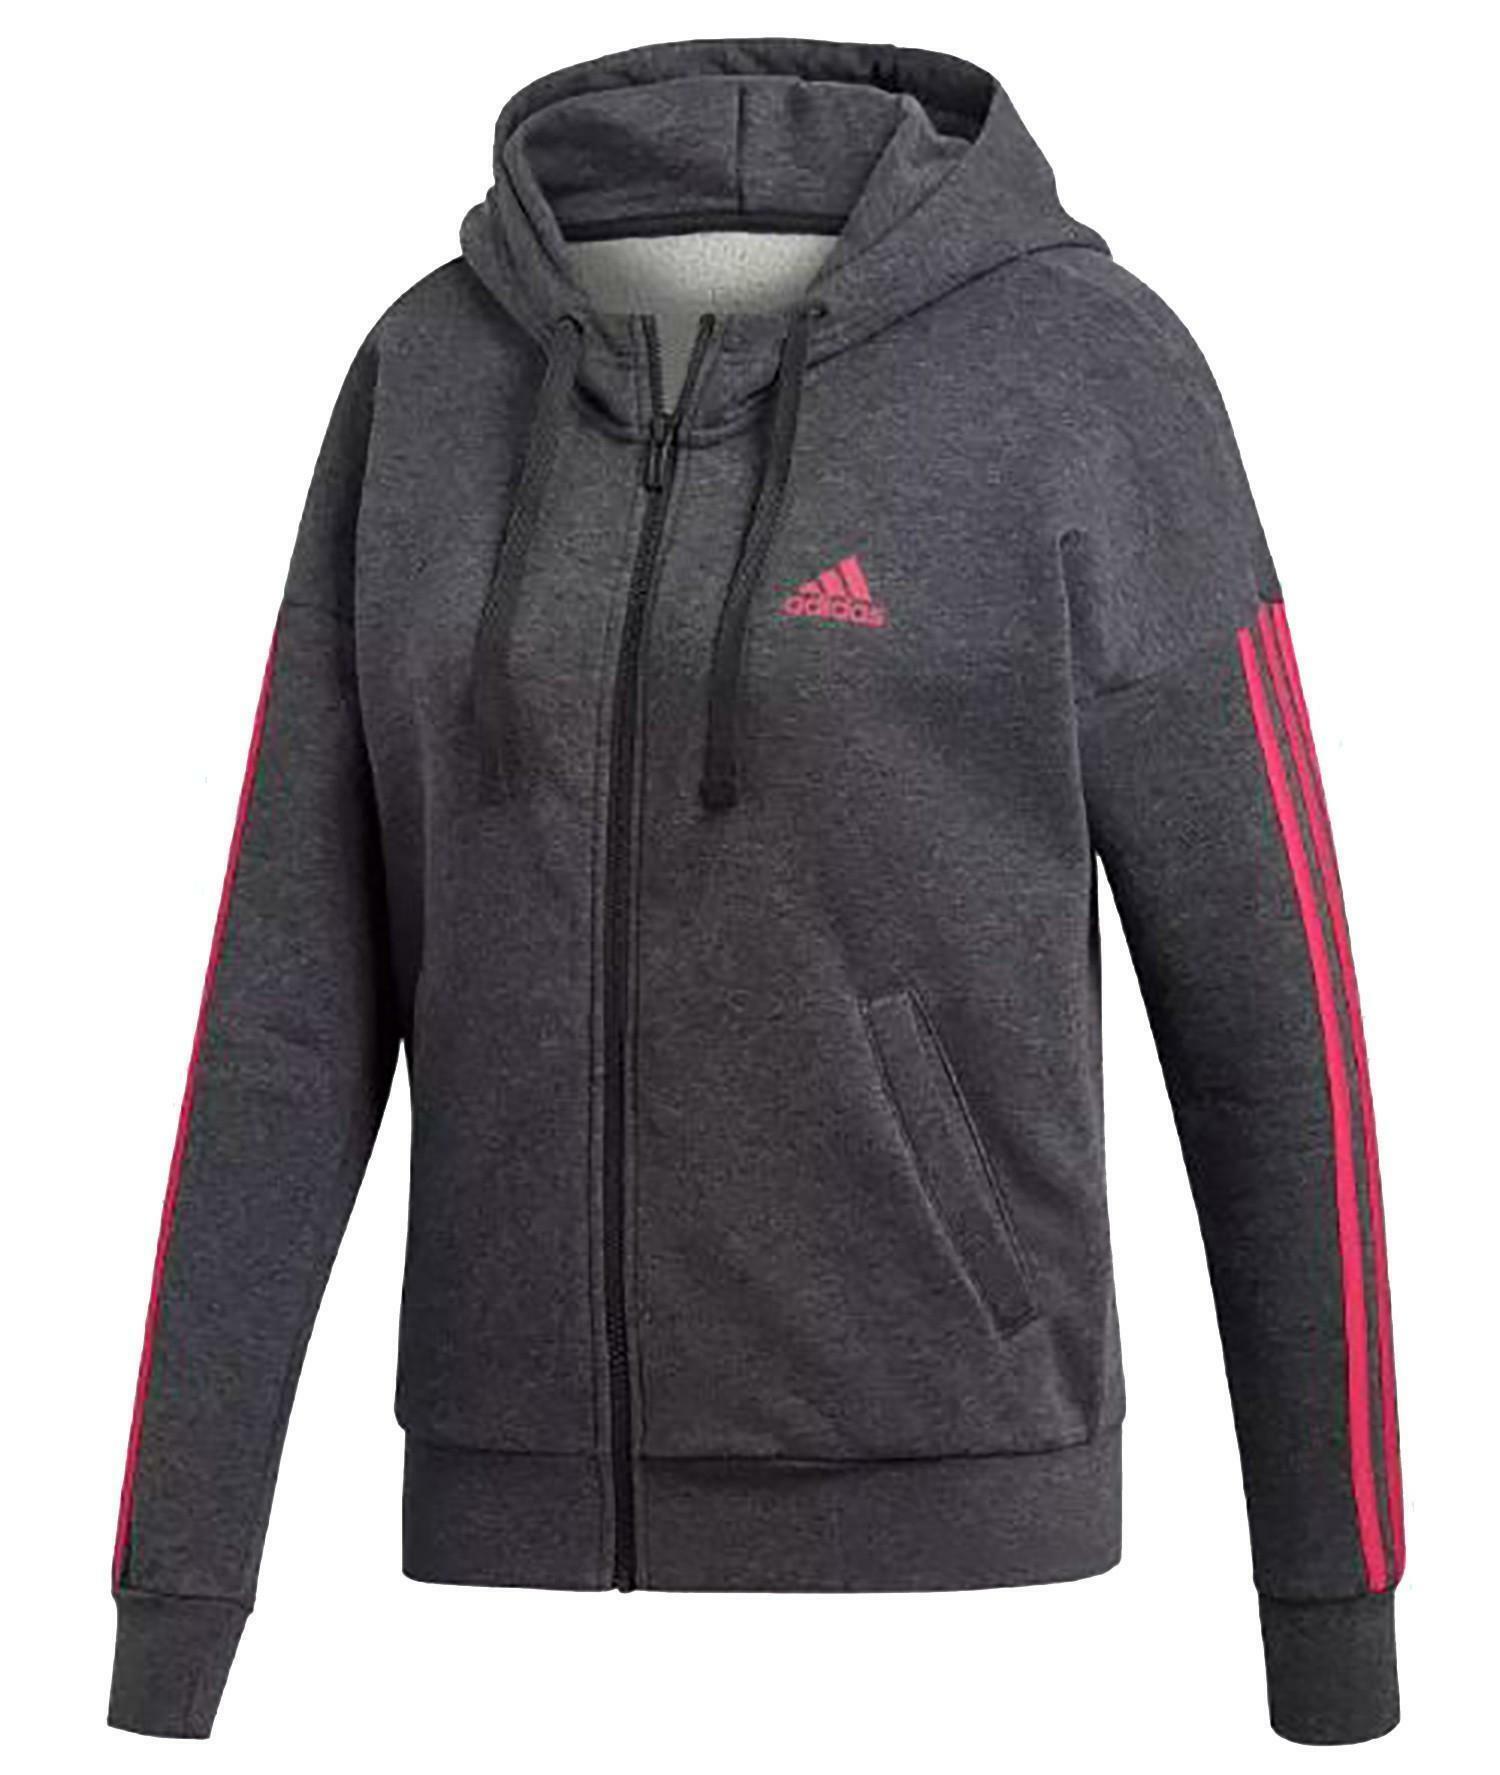 adidas adidas ess lin fz hd giacchetto donna grigio di0127